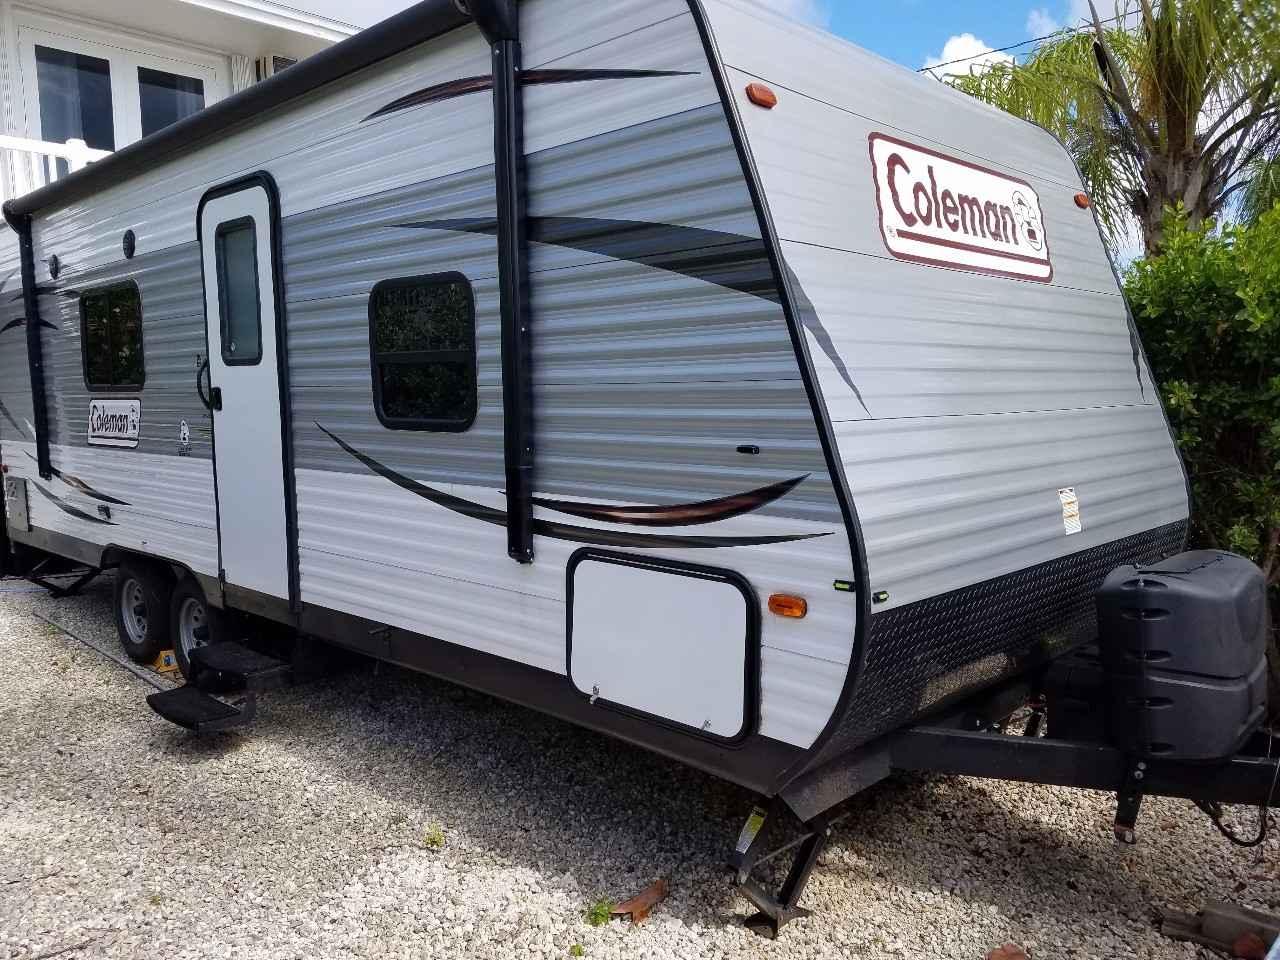 2017 Used Dutchmen Coleman 235qb Travel Trailer In Florida Fl